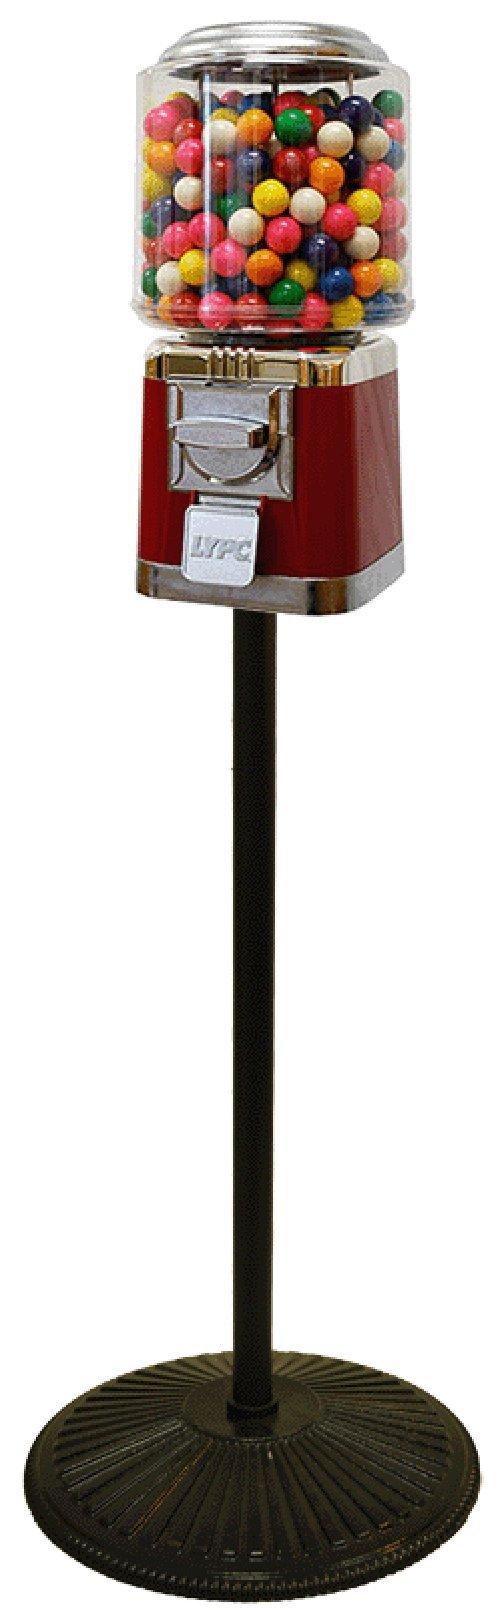 Classic Gumball Machine with Retro Stand